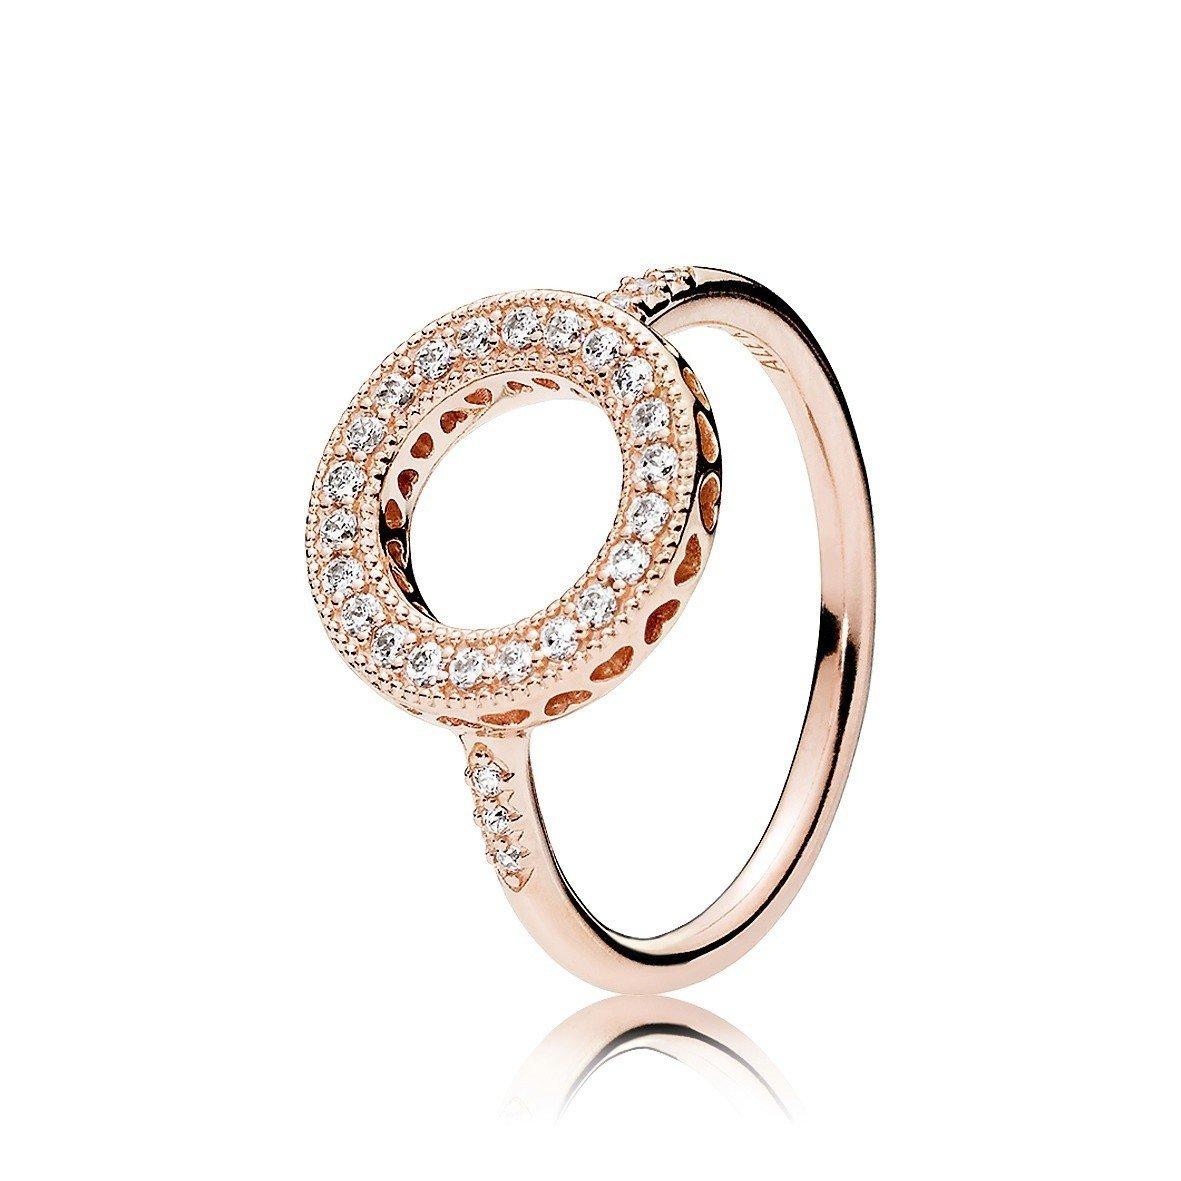 PANDORA Rose 鏤空心形鋯石圓圈戒指,3,880元。圖/PANDORA...